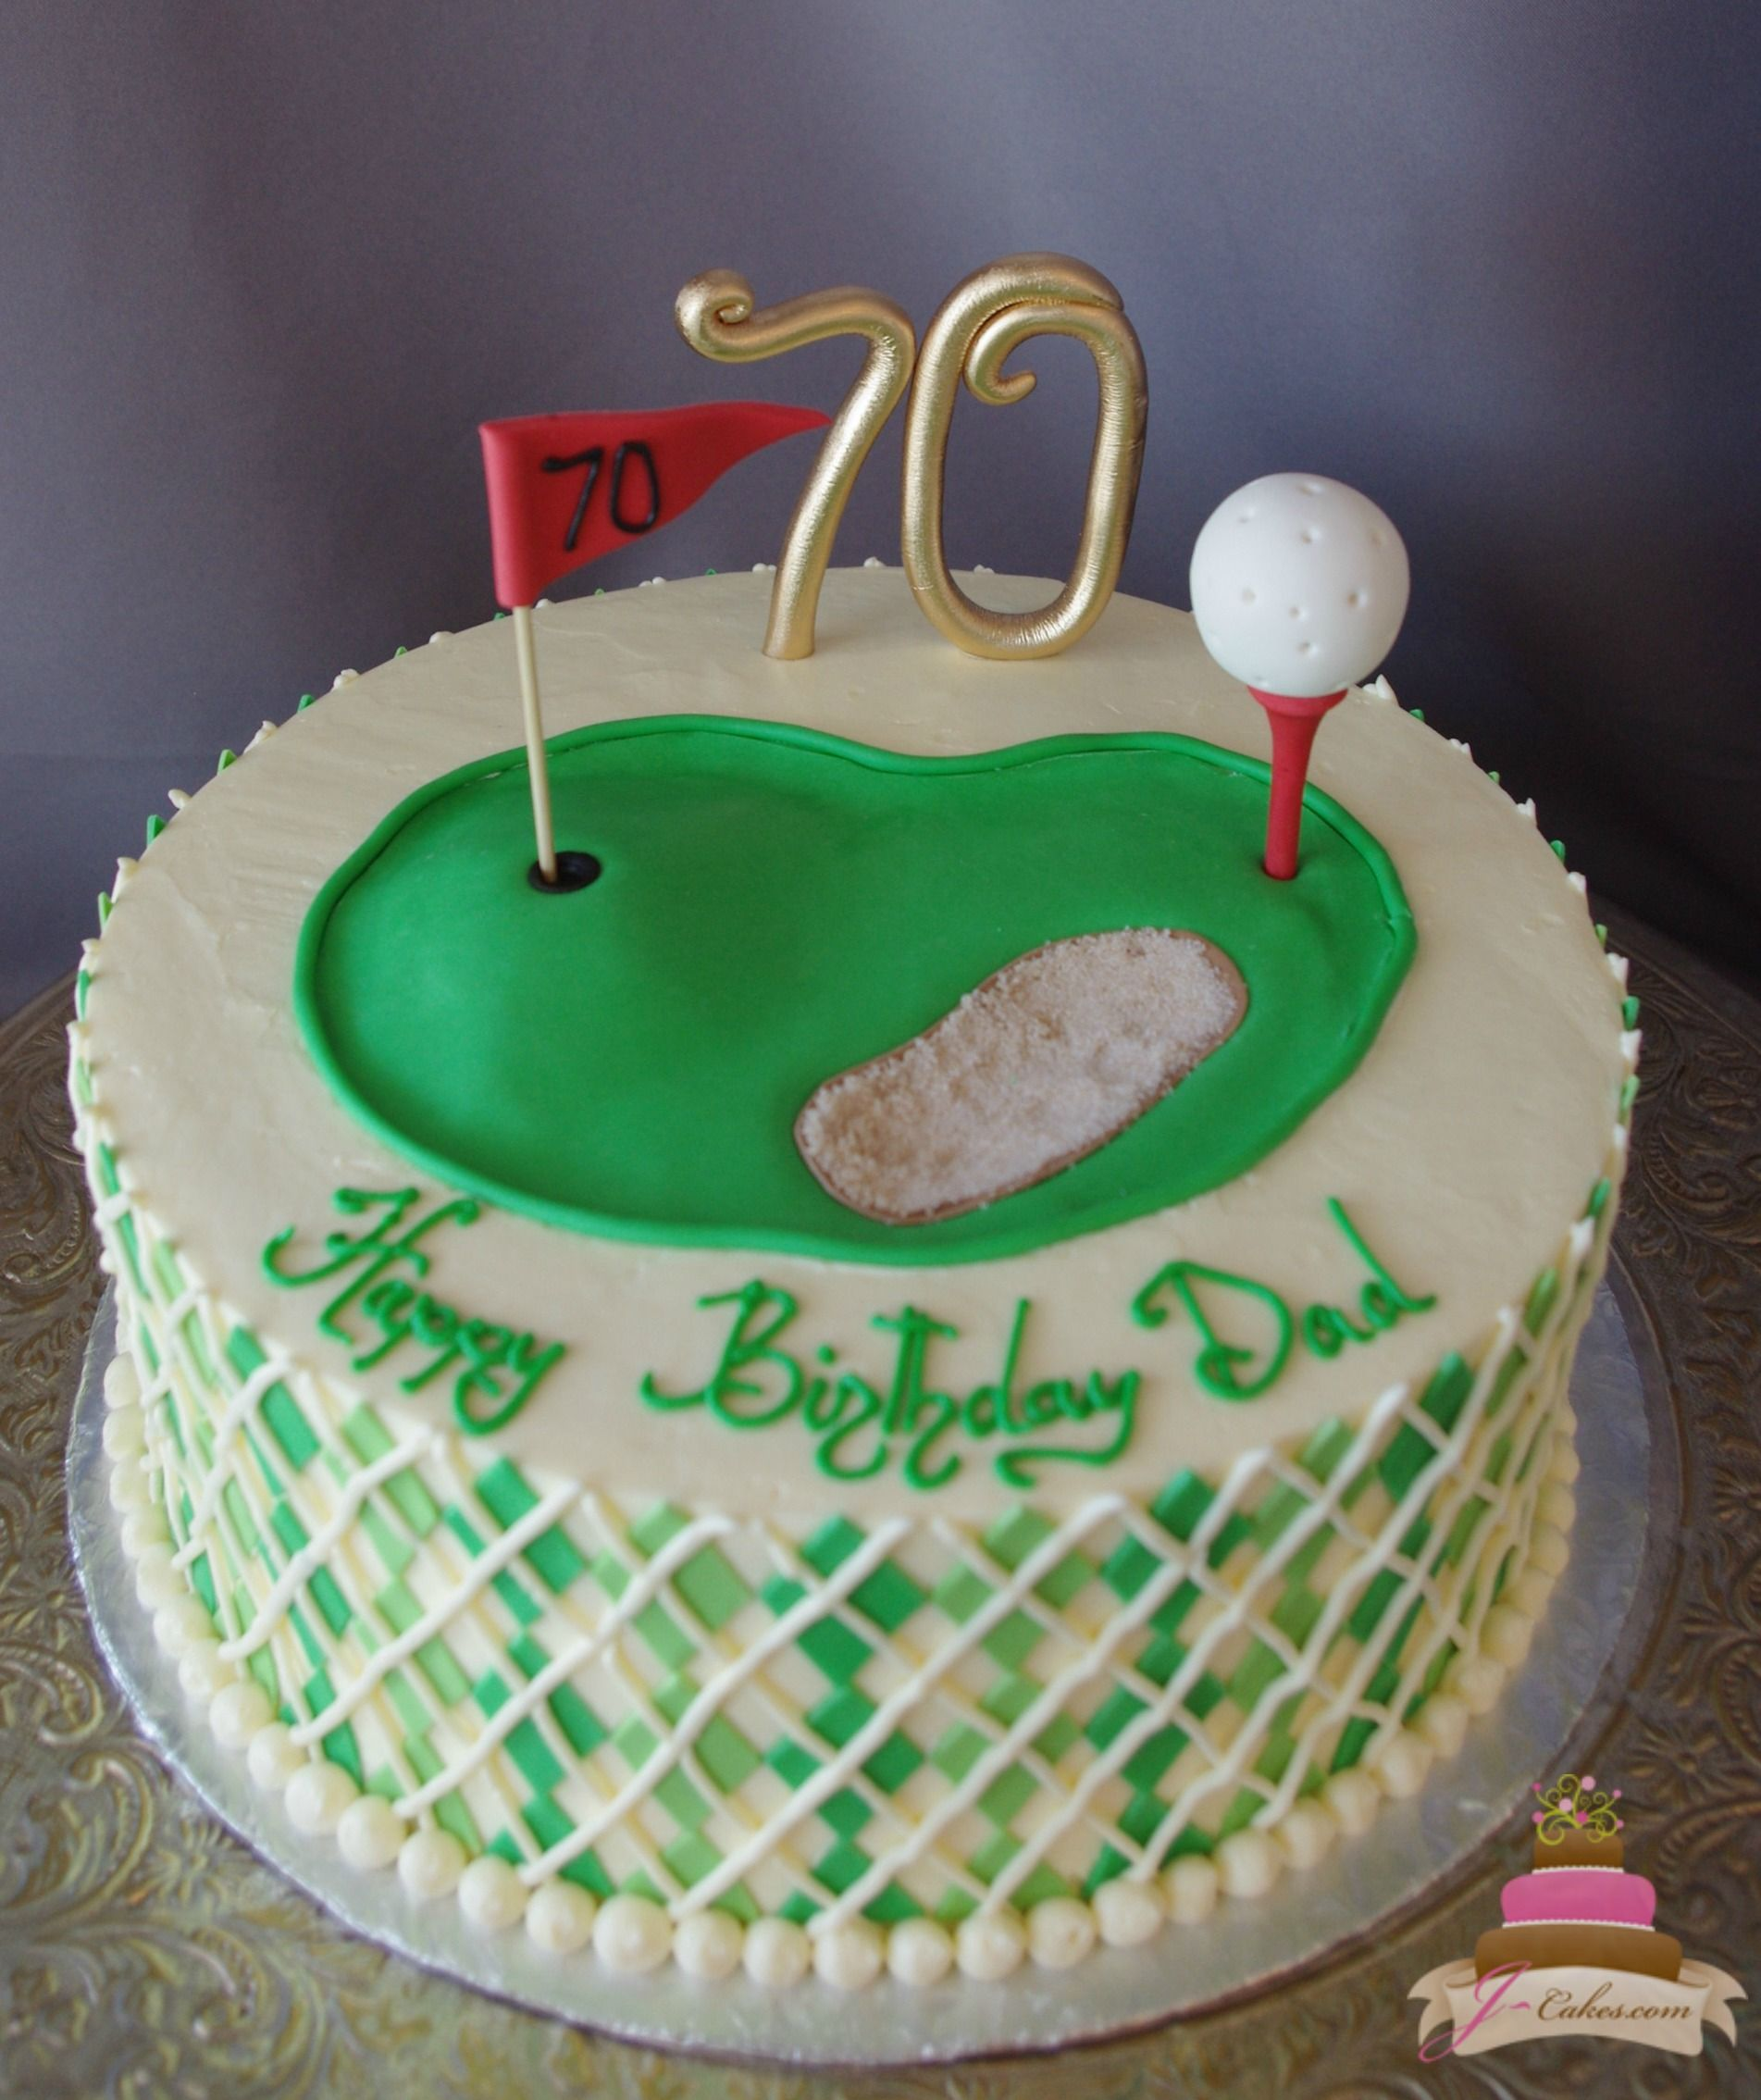 169 Golf Theme Birthday Cake